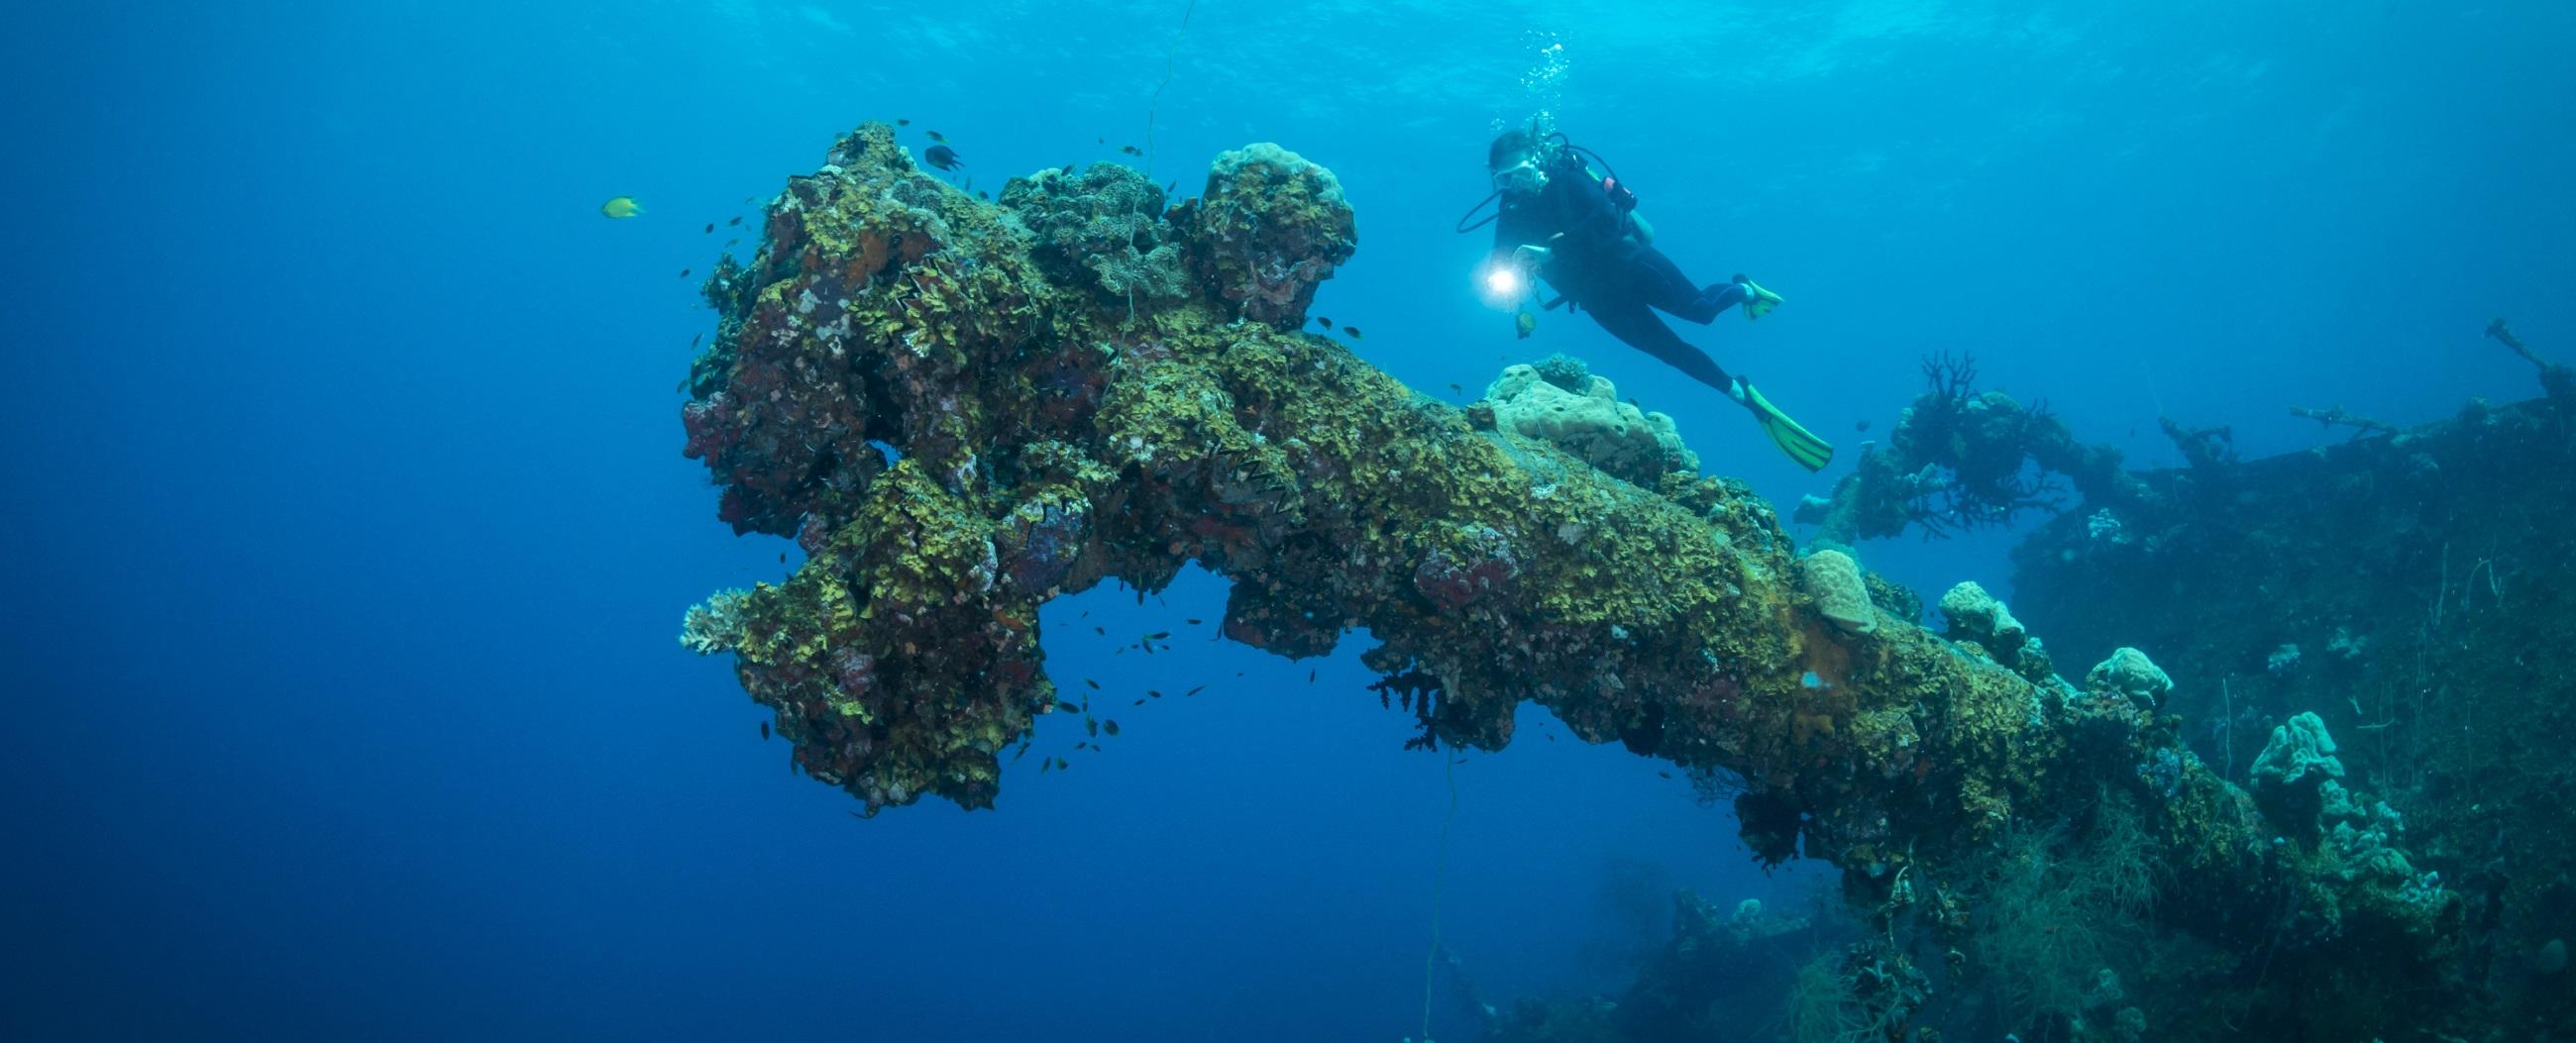 shipwreck travel